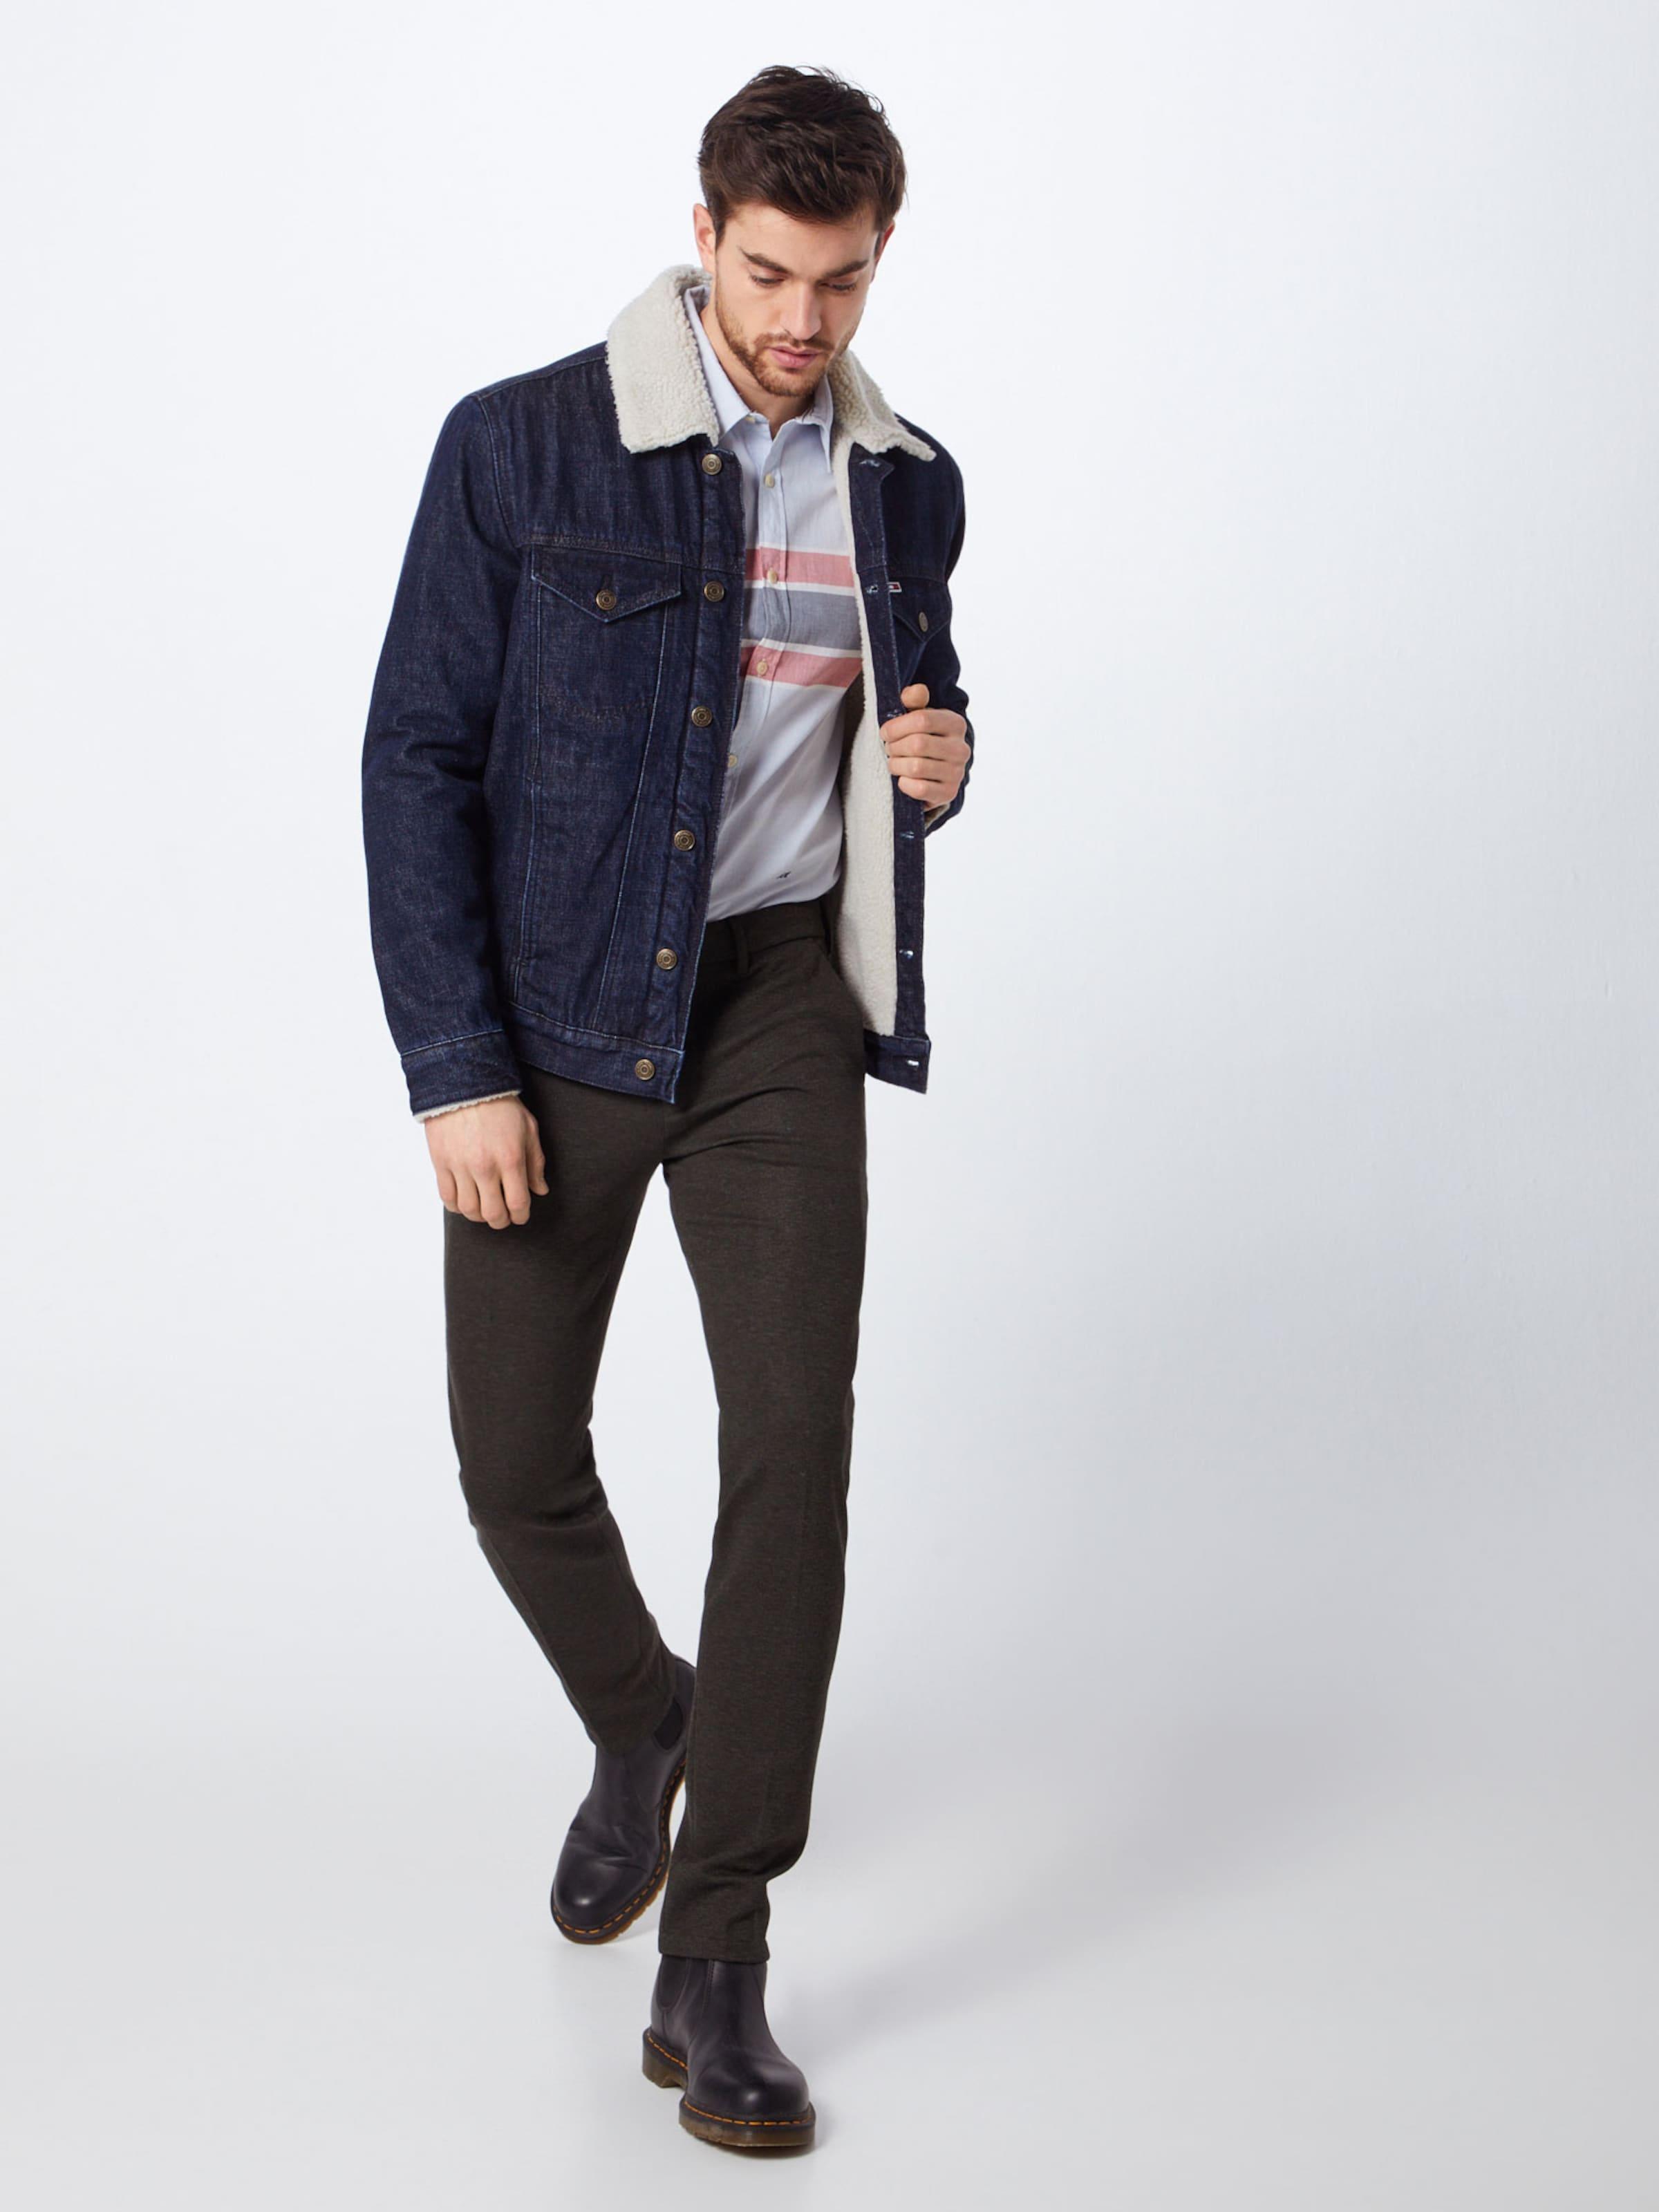 HellblauRot Hemd 'wyatt' In Jeans Pepe qMzGSUpV